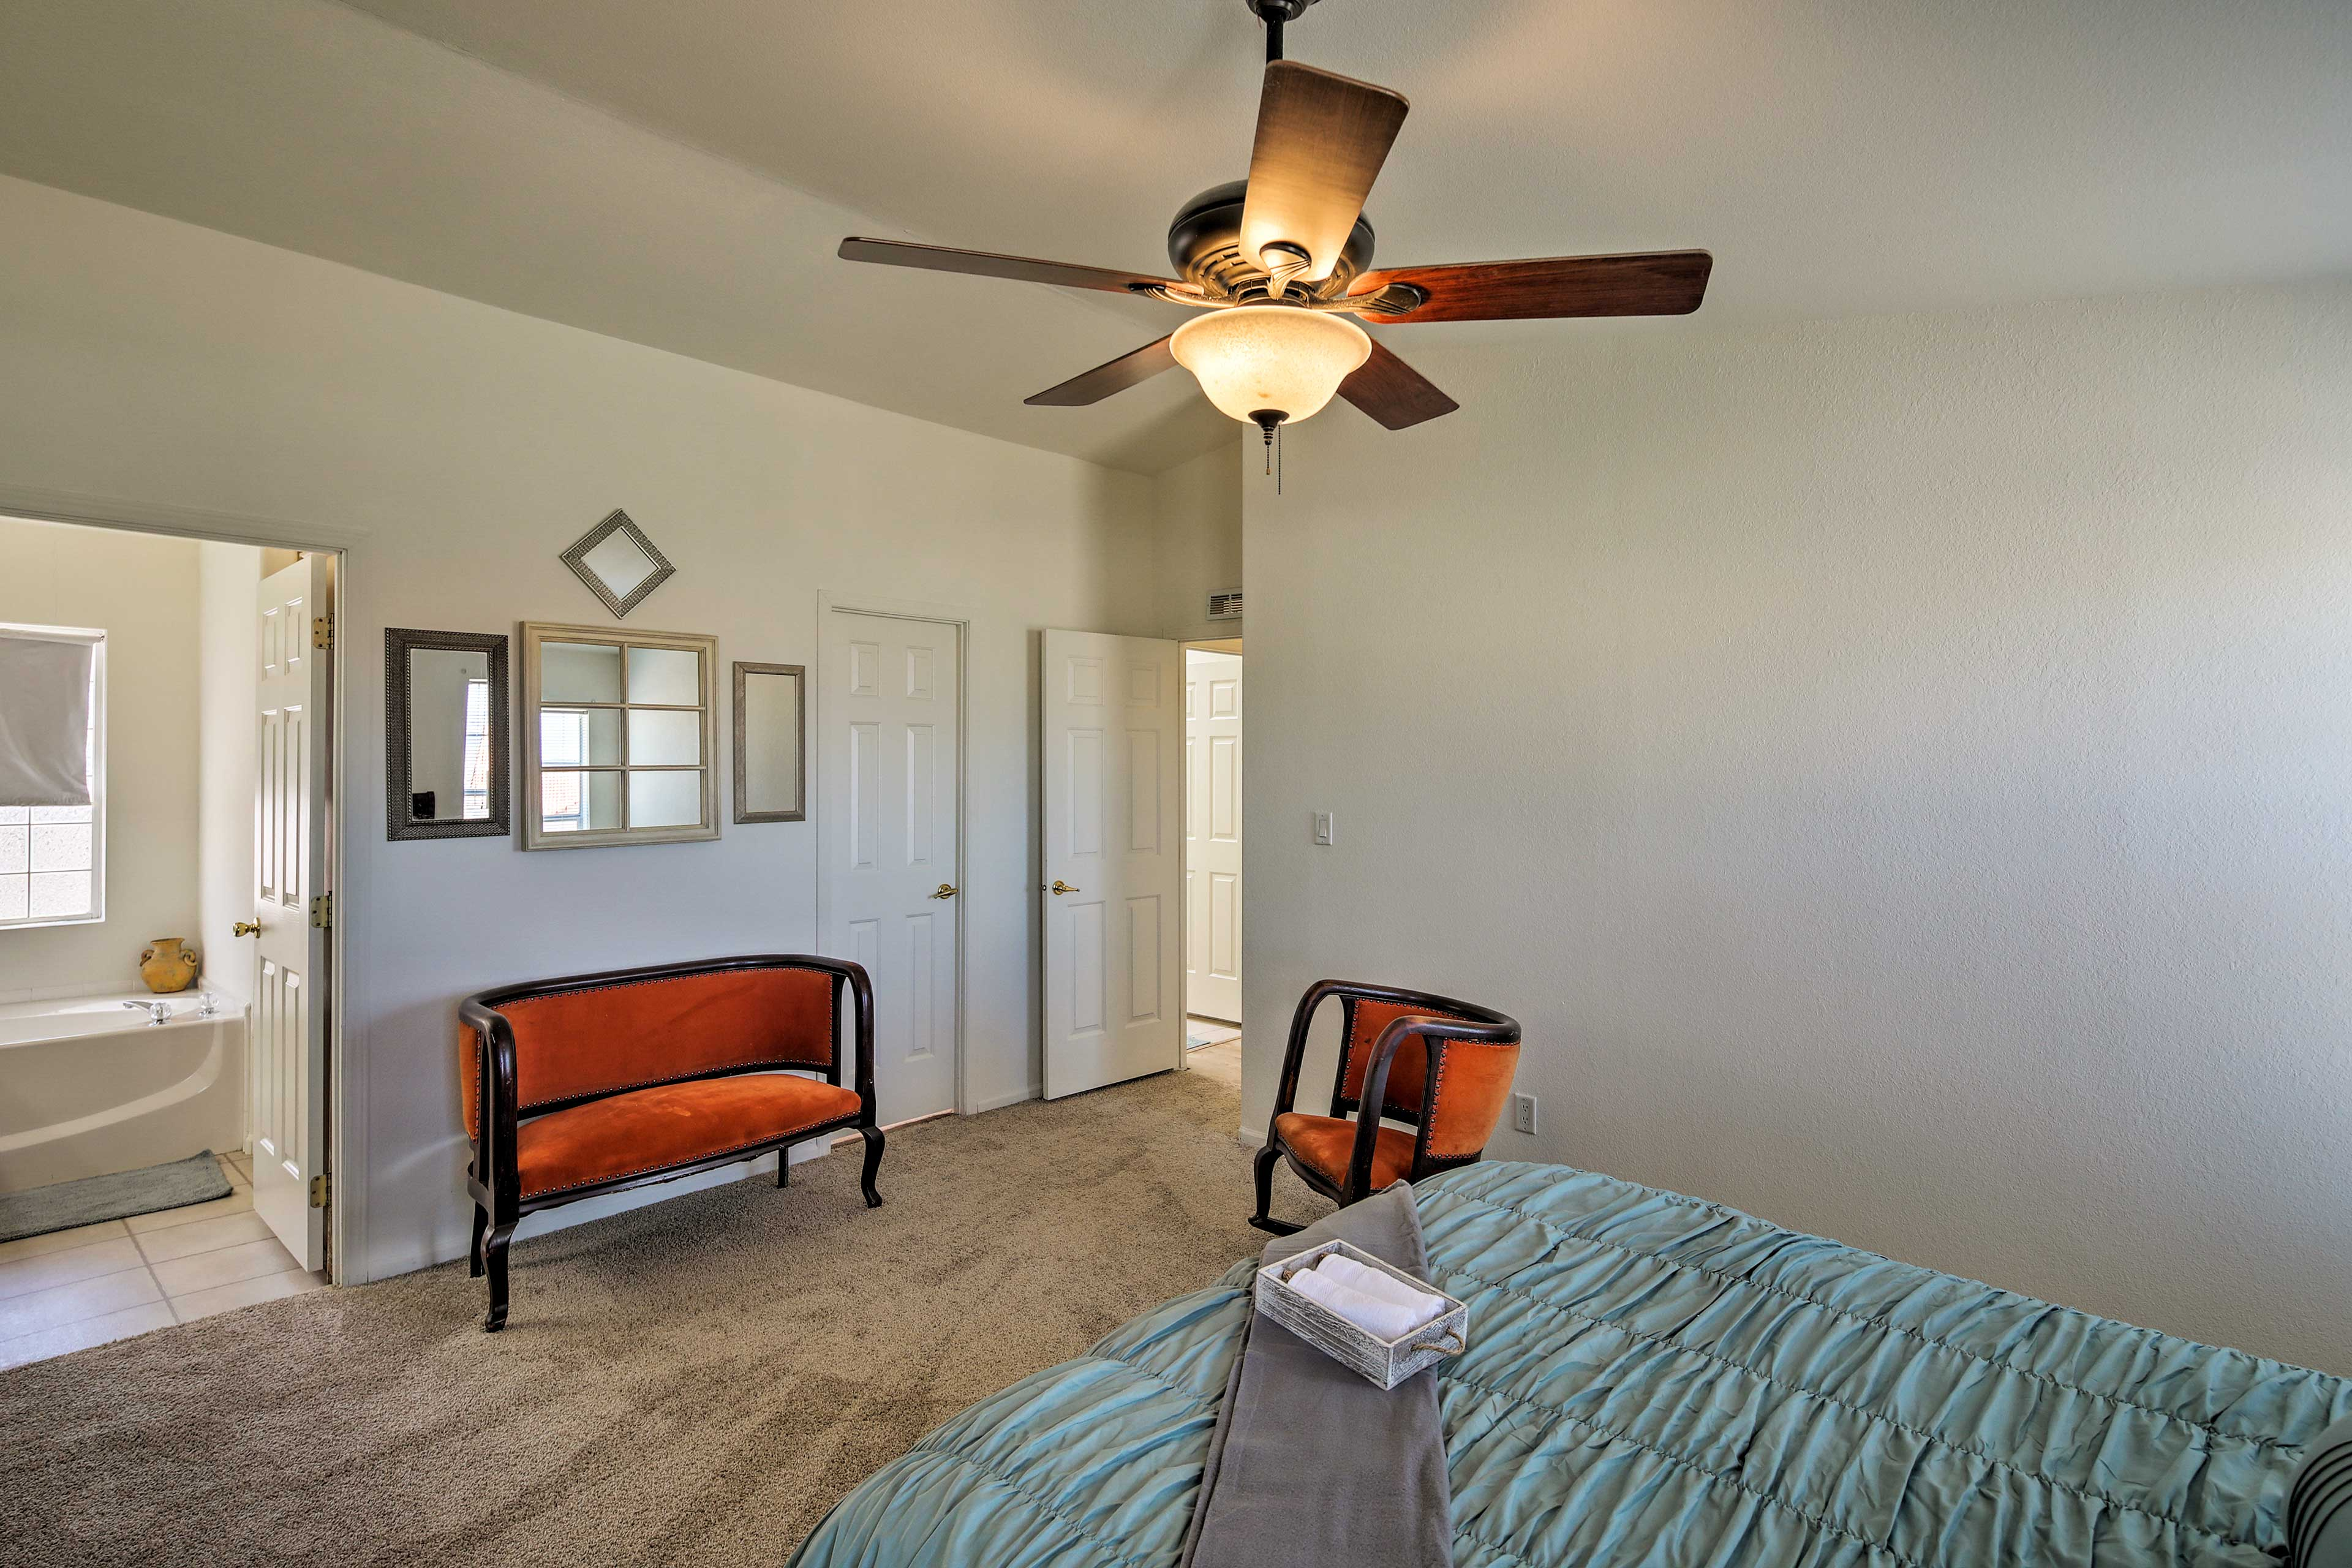 Primary Bedroom | Loveseat No Longer in This Room